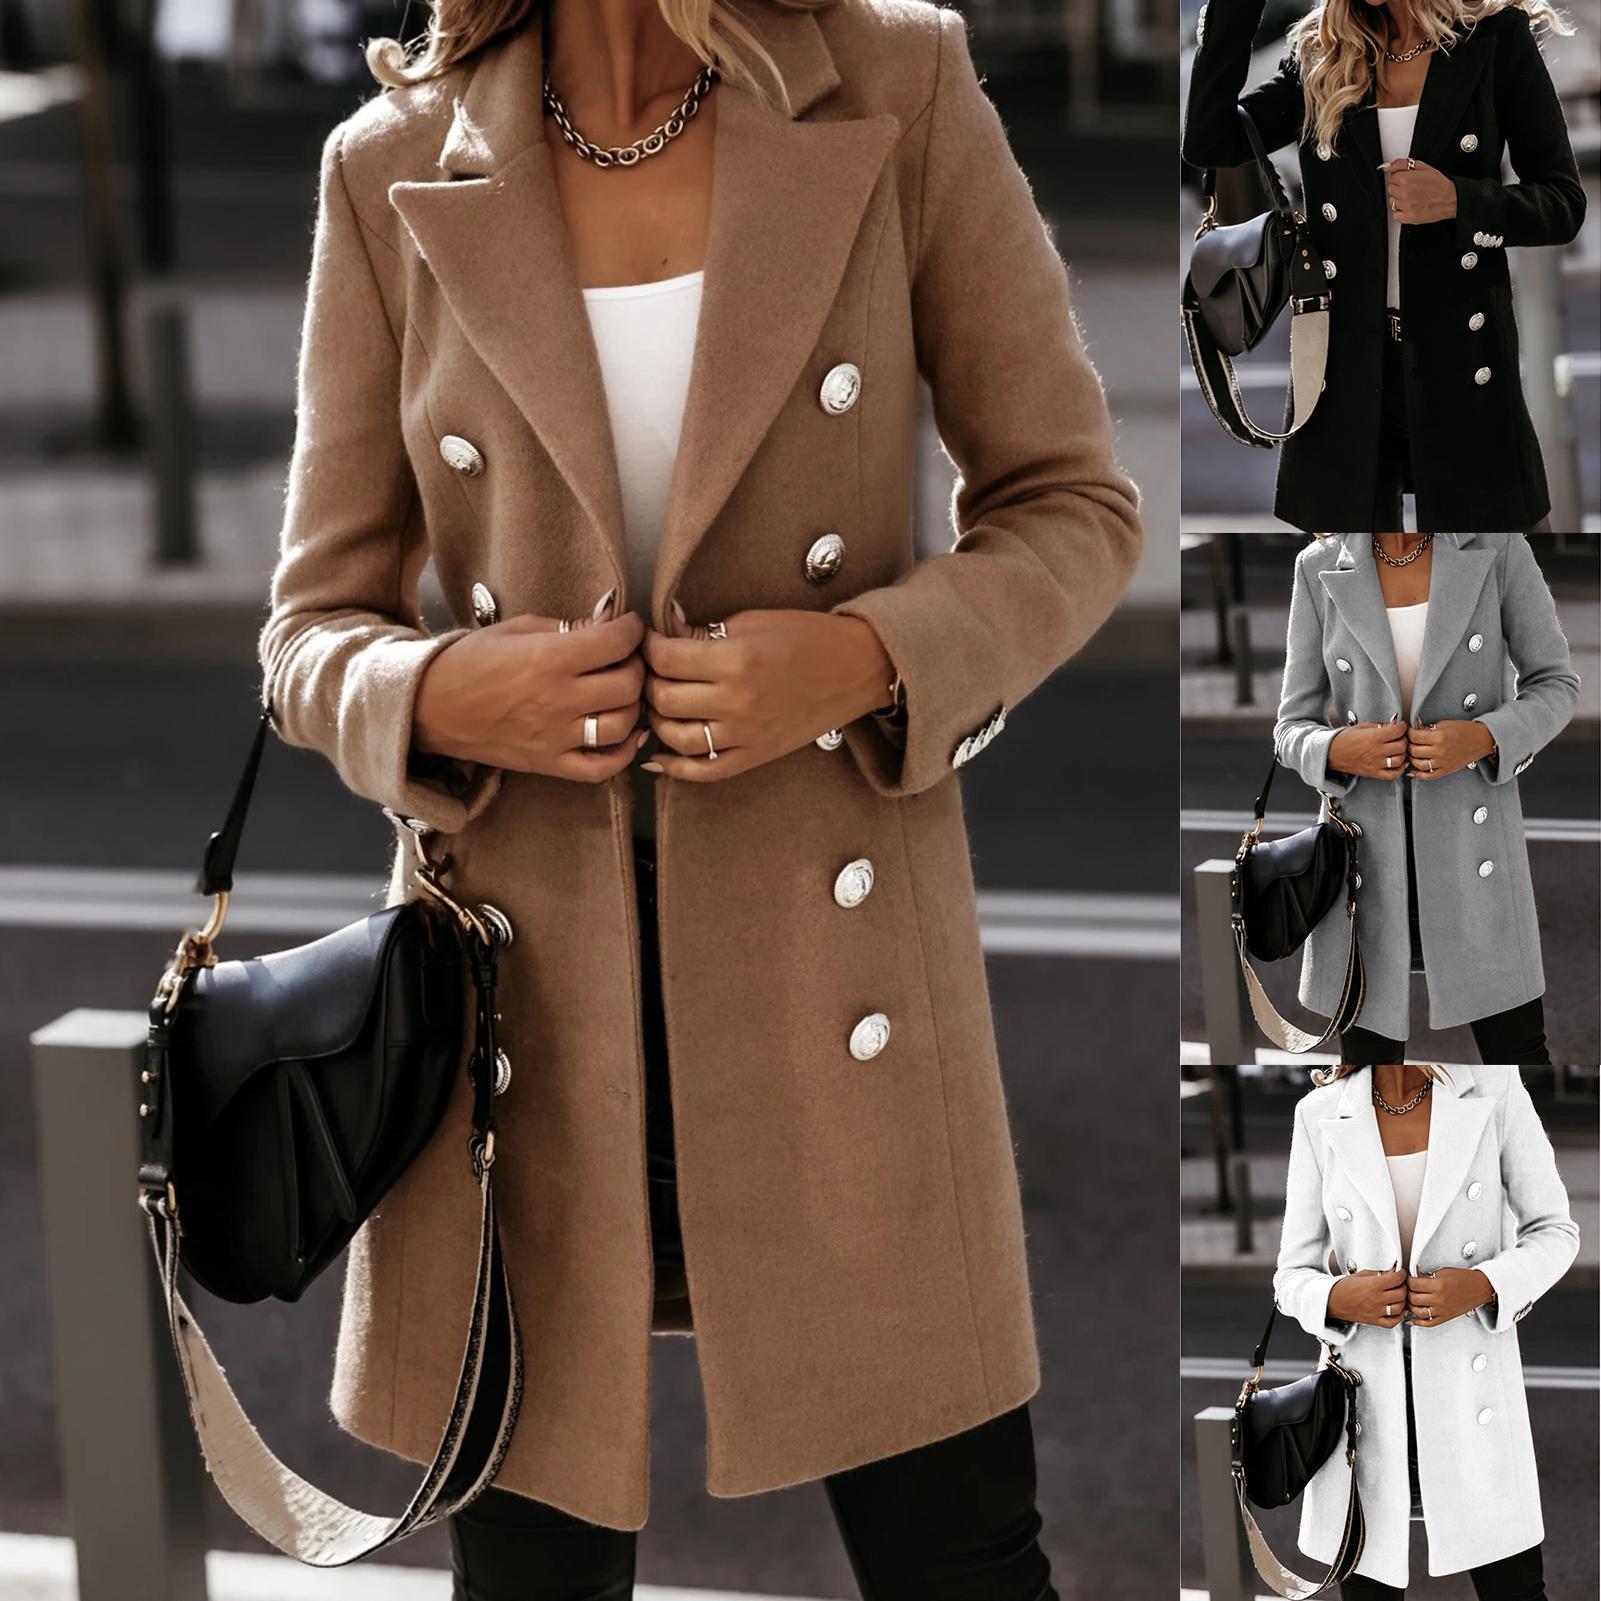 Coat Fleece Sweatshirts Cardigan Women Jacket Winter Women Lapel Trench Coat Long Sleeve Button Mid-